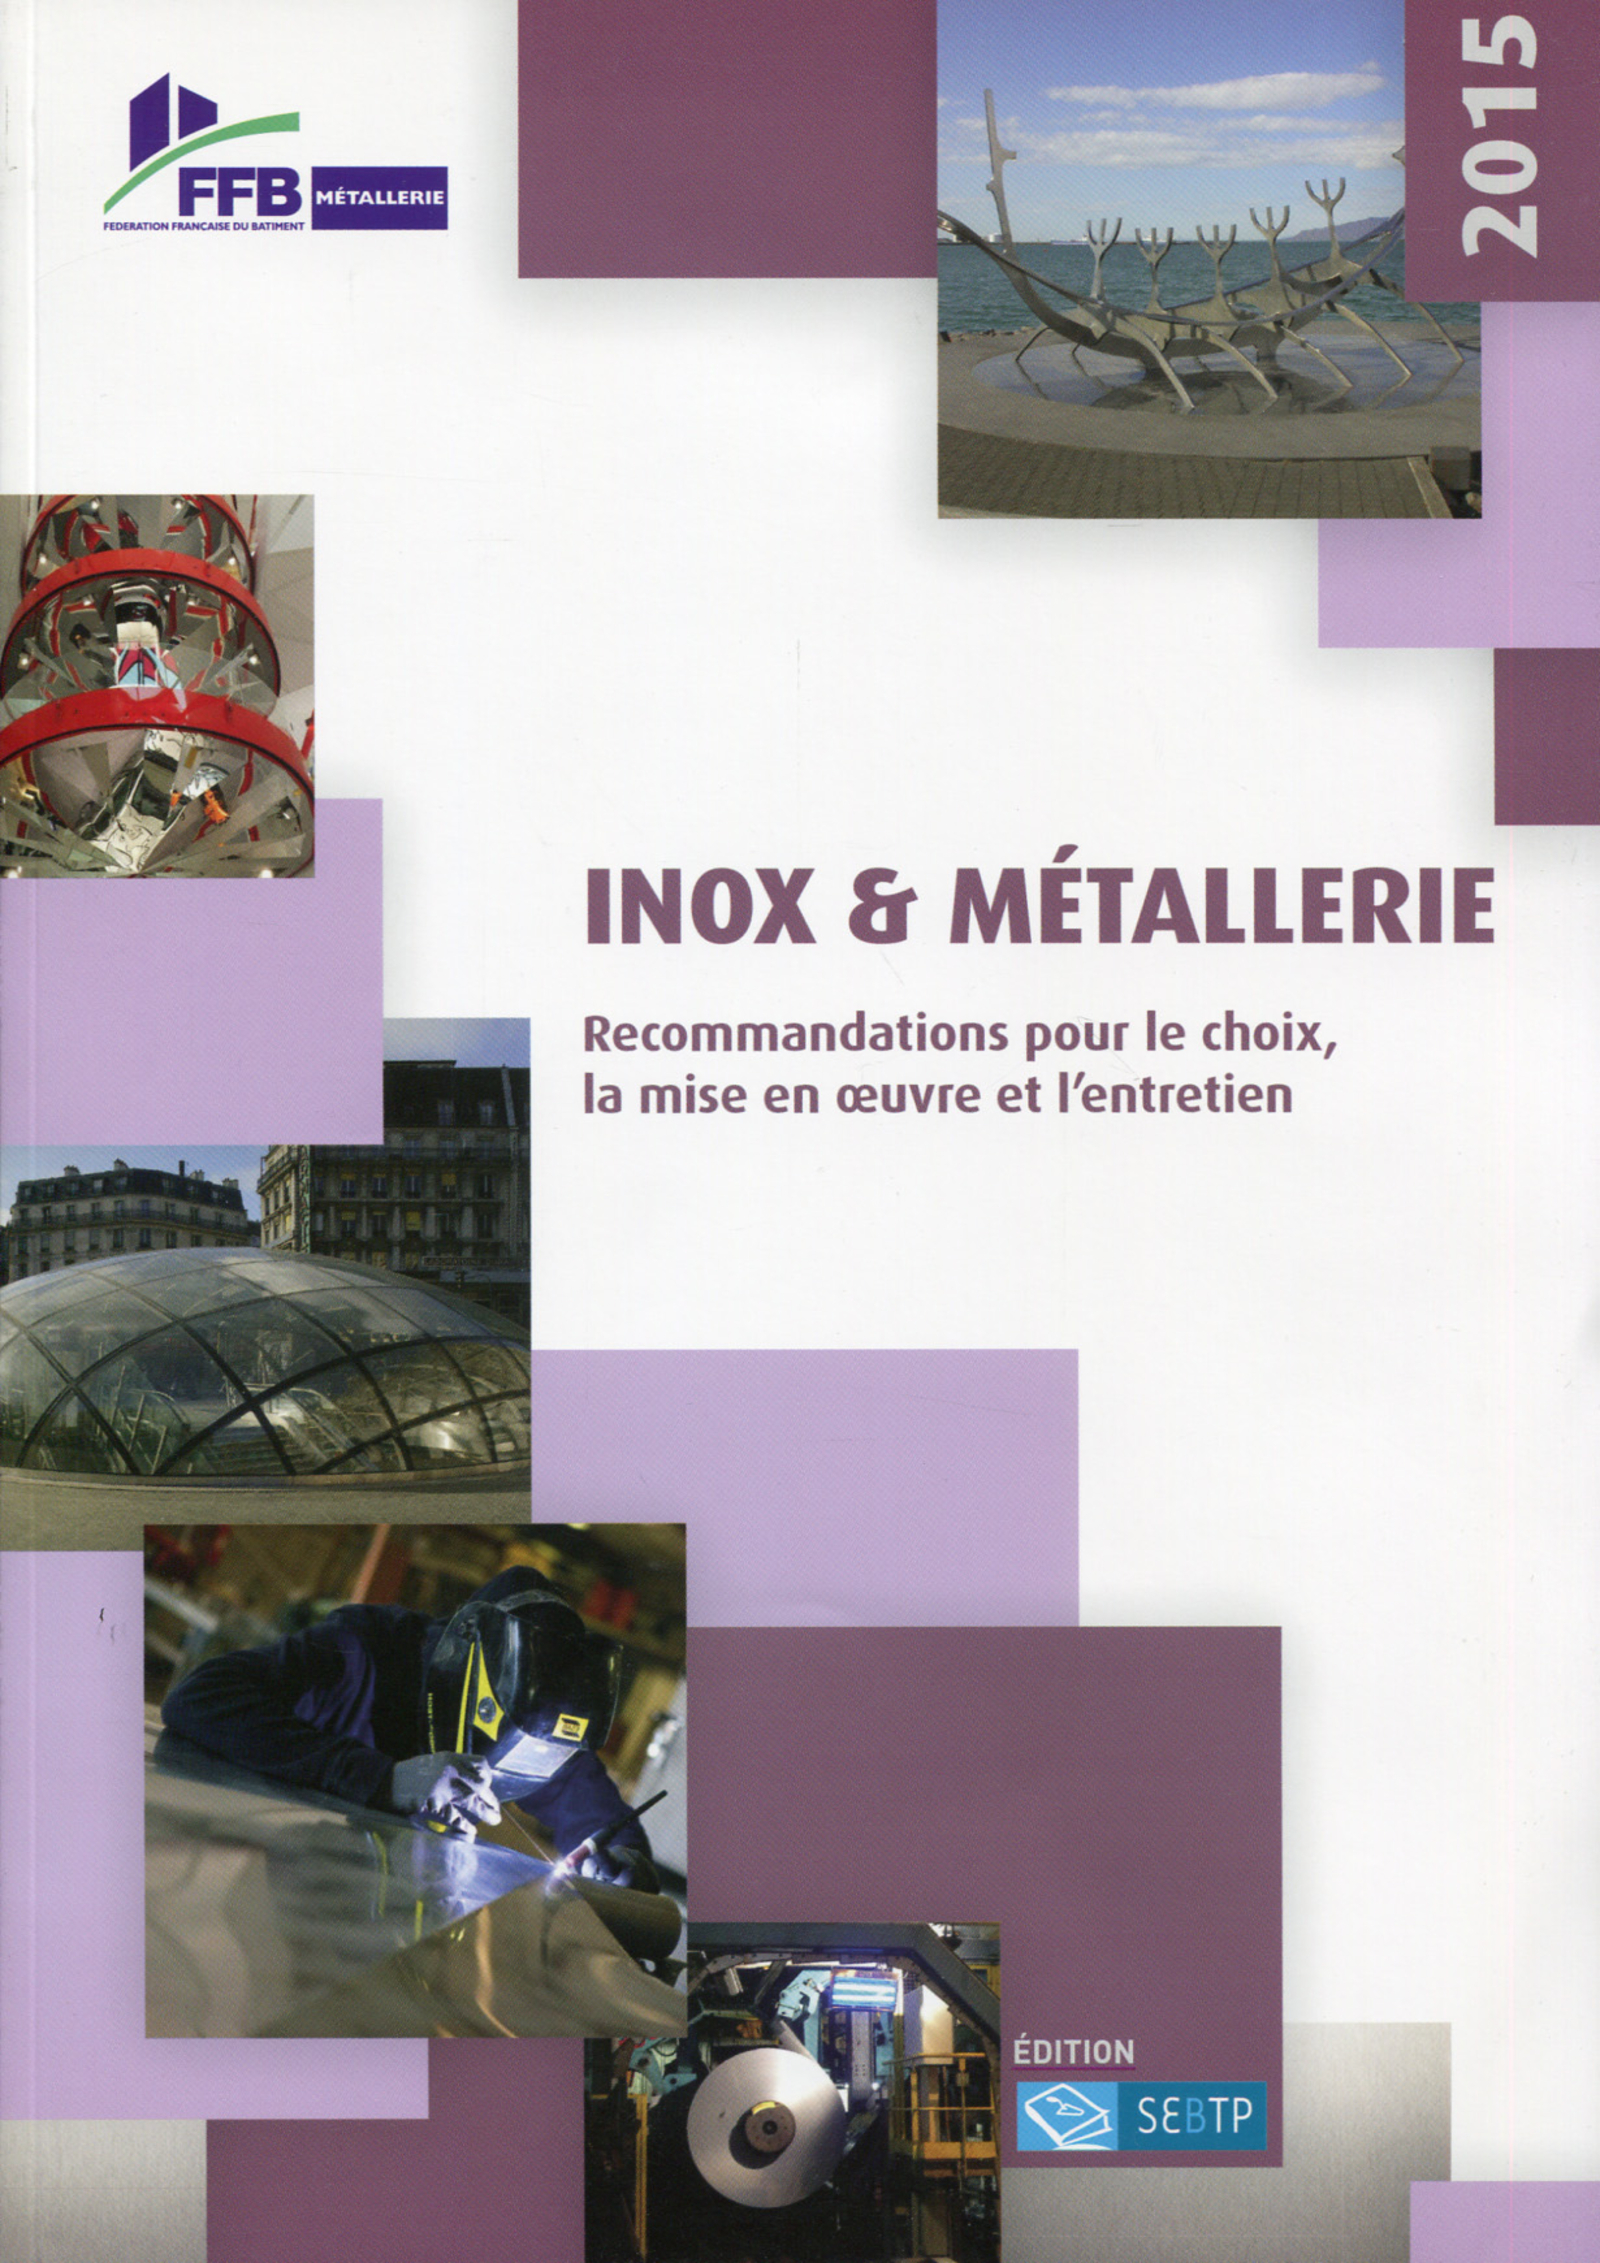 inox, métallerie